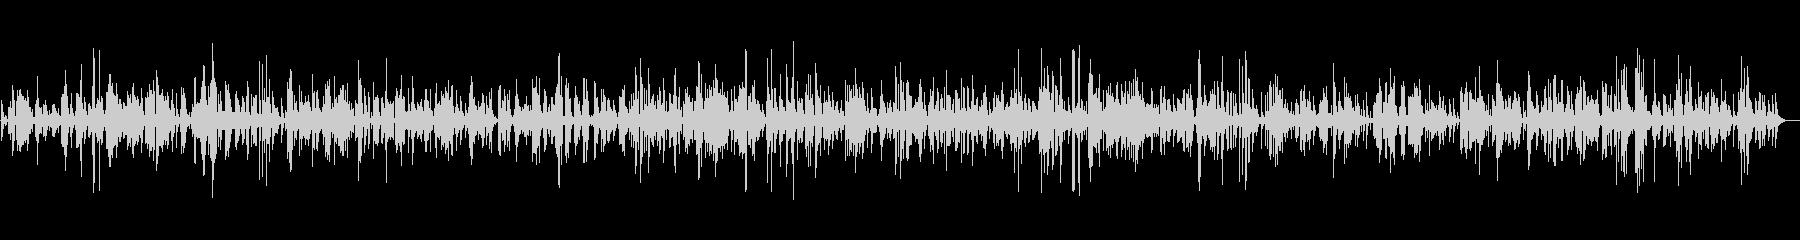 BGM|カフェで癒されるピアノJAZZの未再生の波形